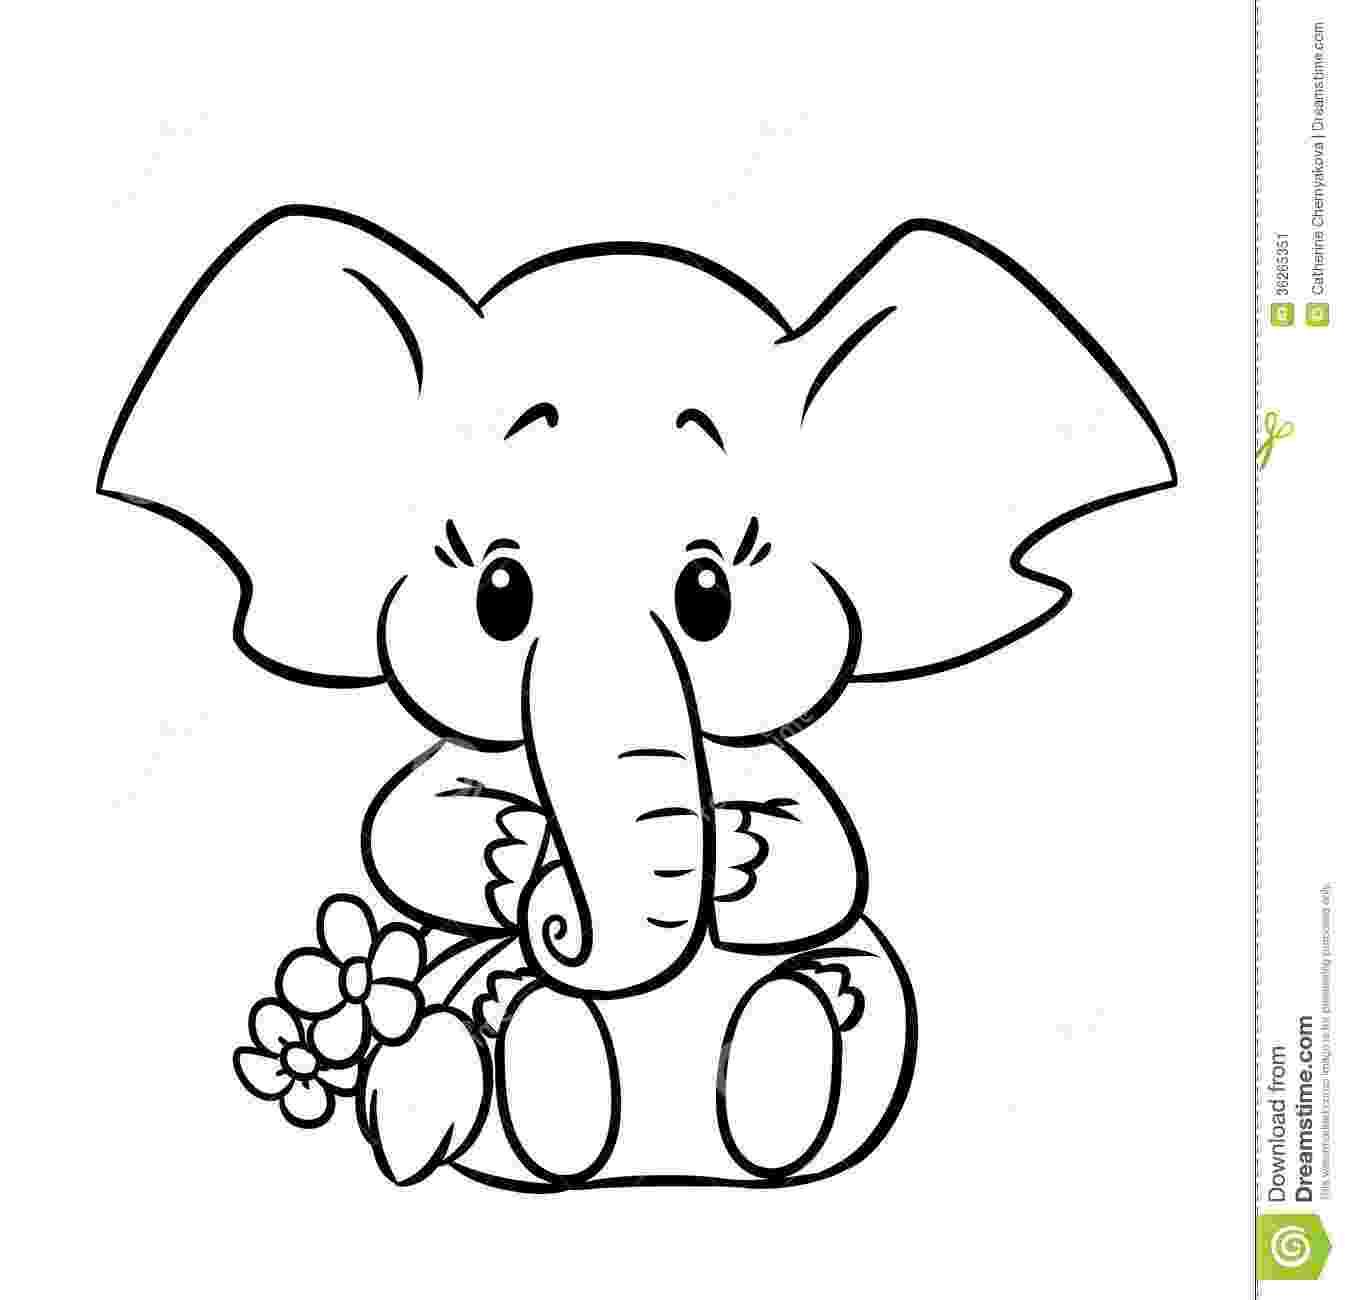 elephant coloring sheet baby elephant coloring pages getcoloringpagescom sheet elephant coloring